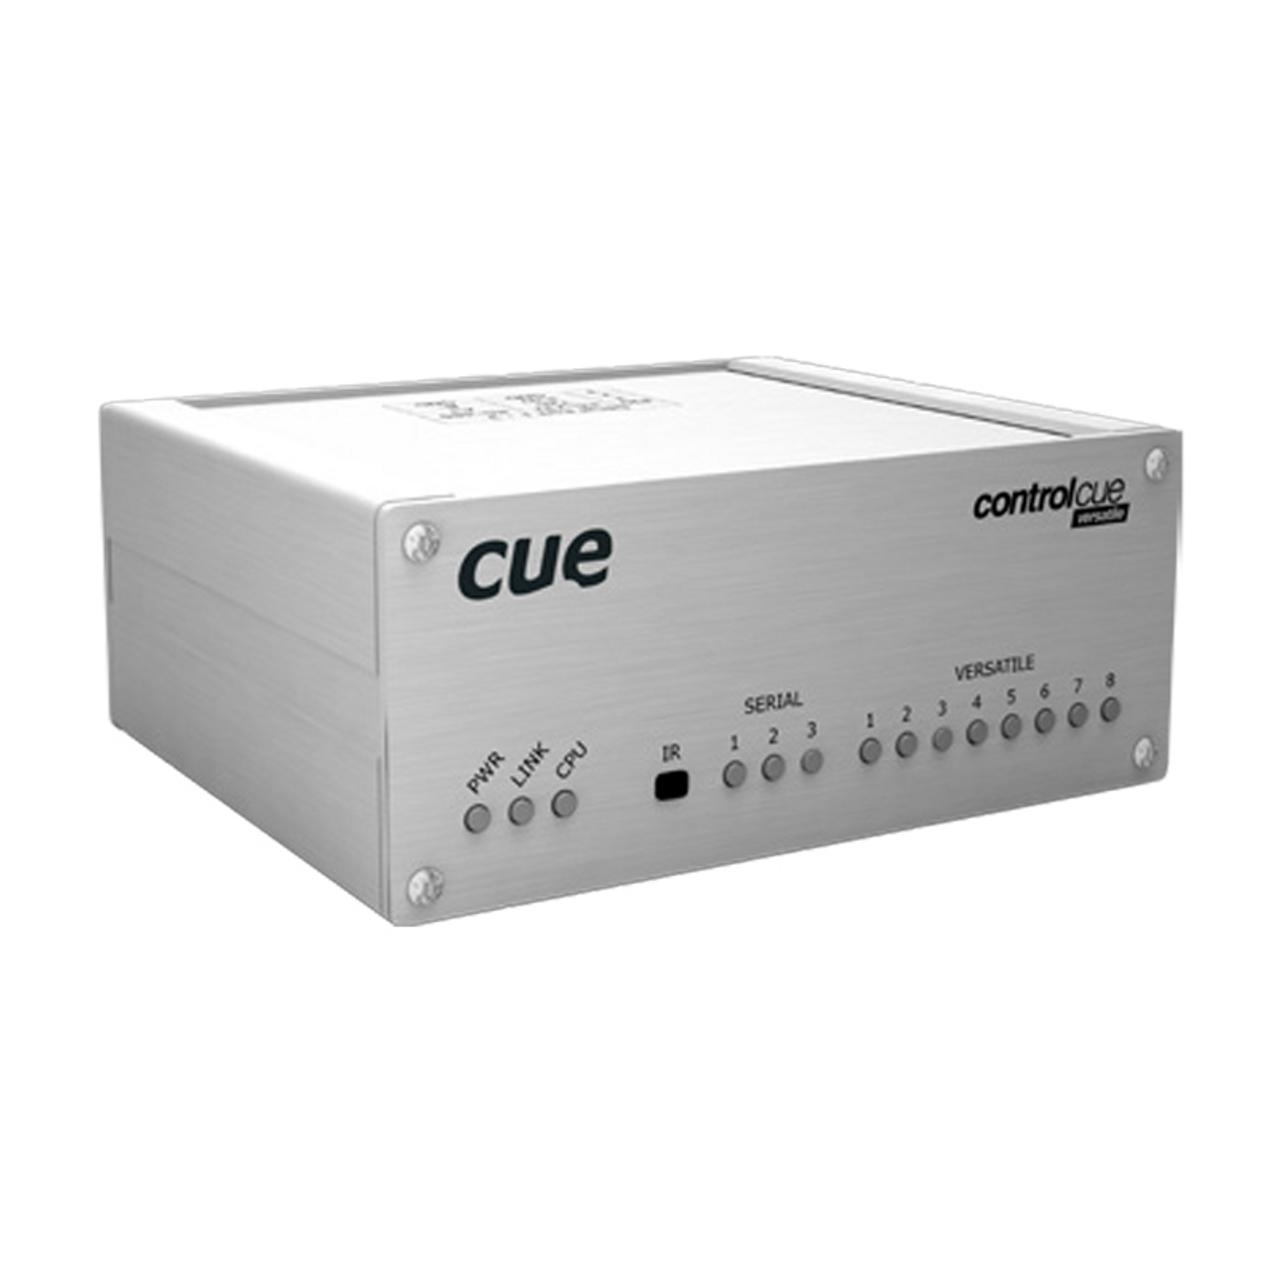 controlCUE- versatile